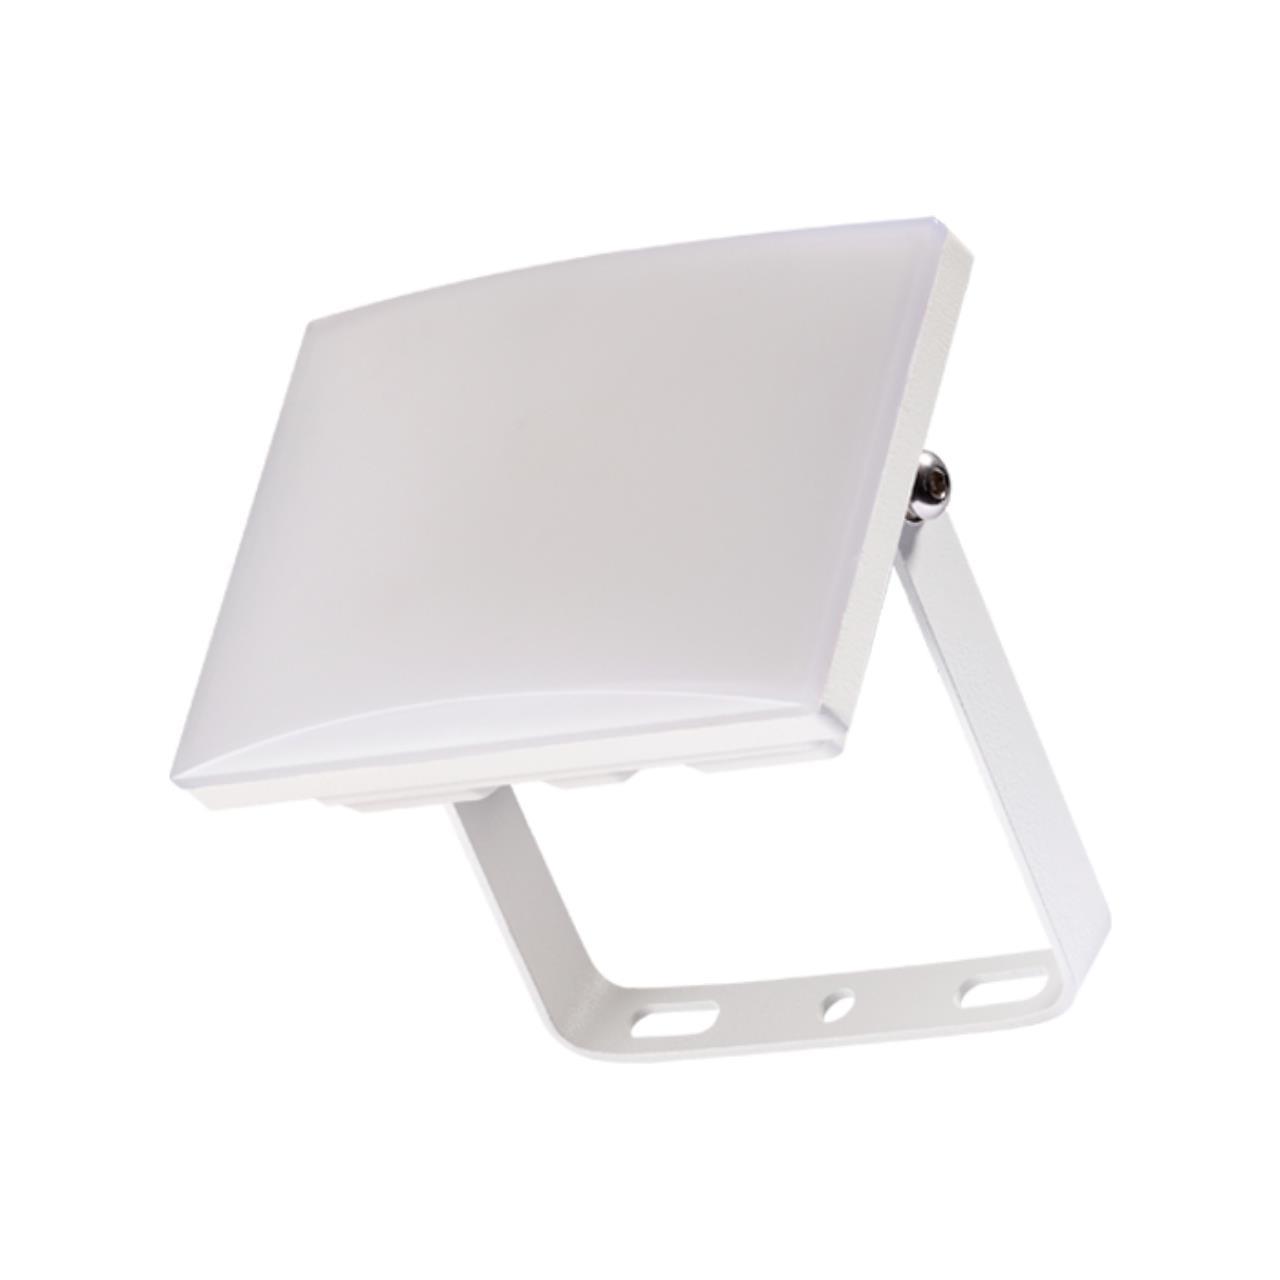 358138 STREET NT19 175 белый Светодиодный прожектор IP65 LED 4000K 20W 220 - 240V ARMIN LED